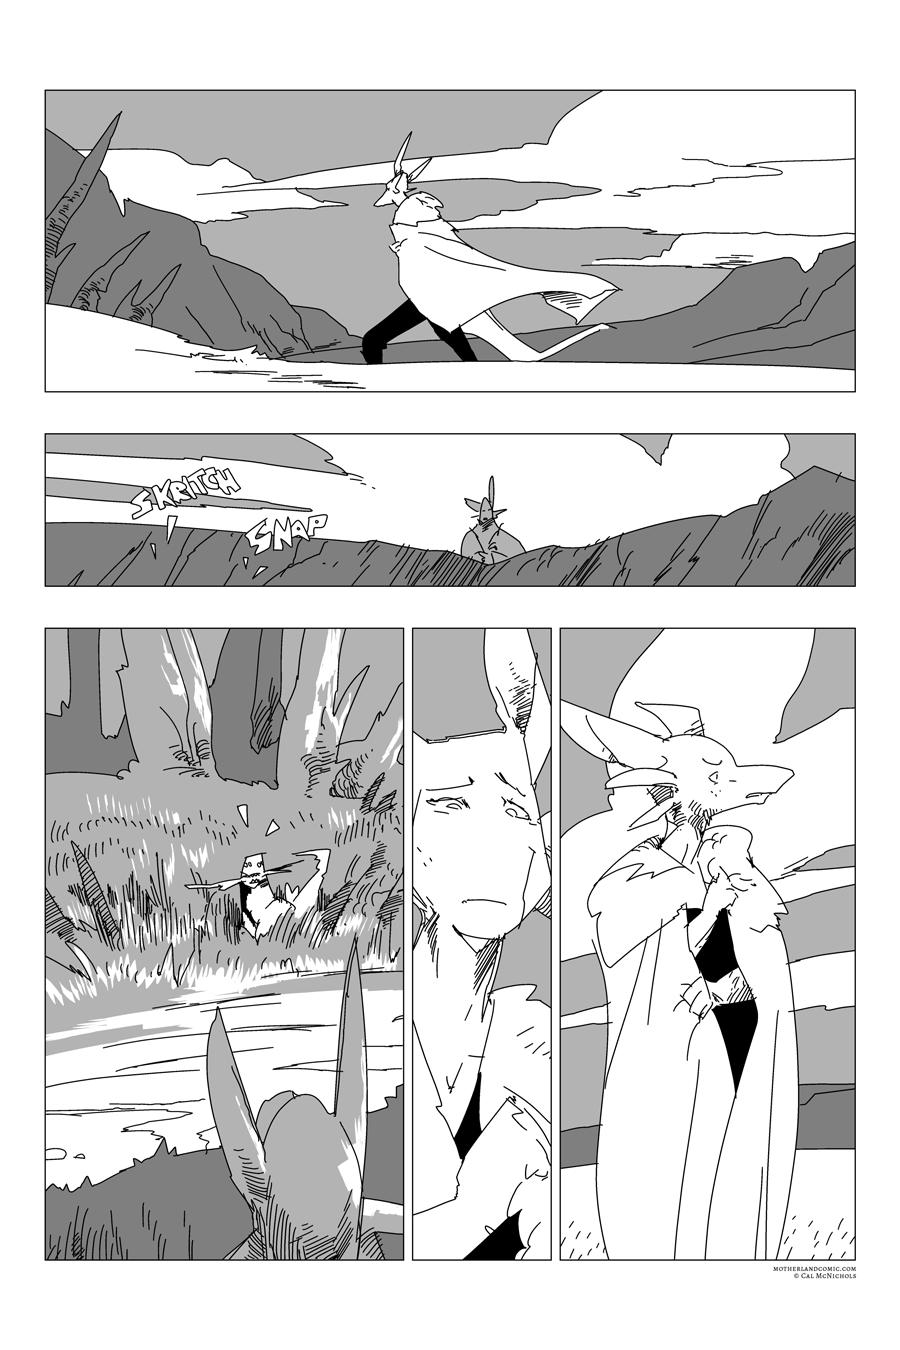 pg 120